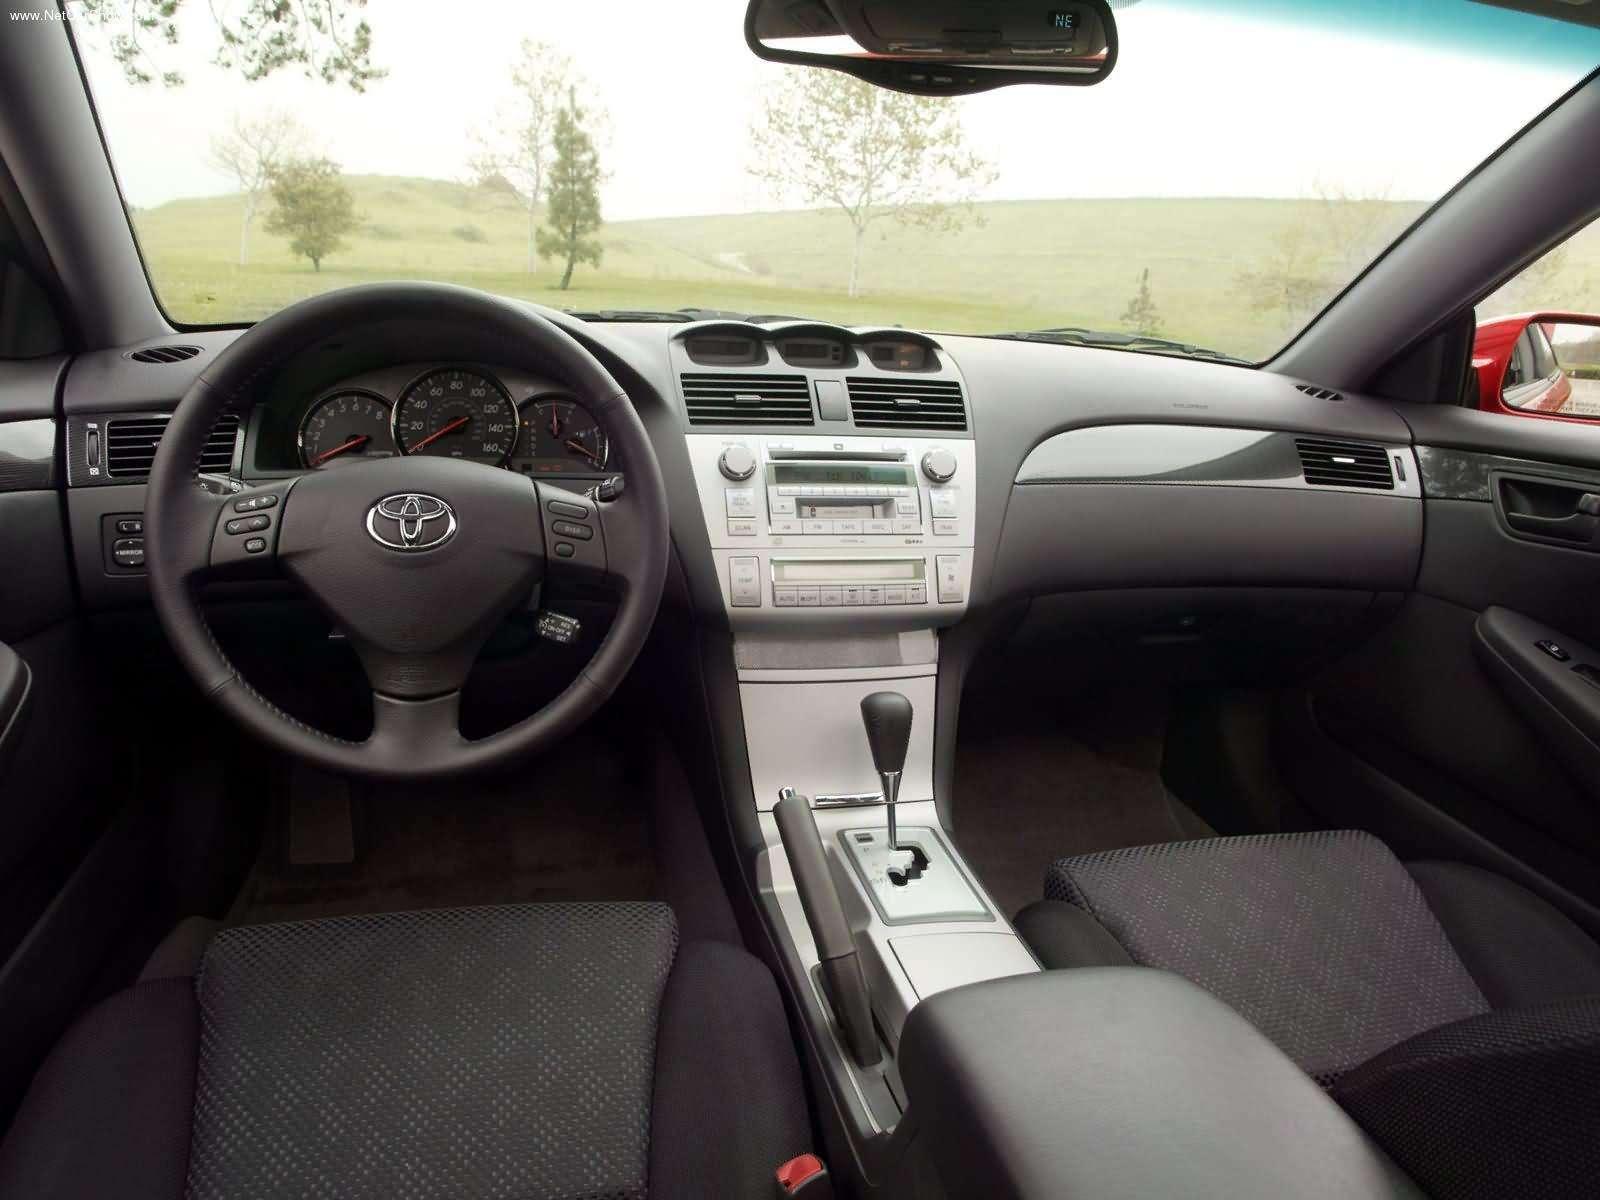 Toyota Camry Solara II 2003 - 2009 Coupe #7